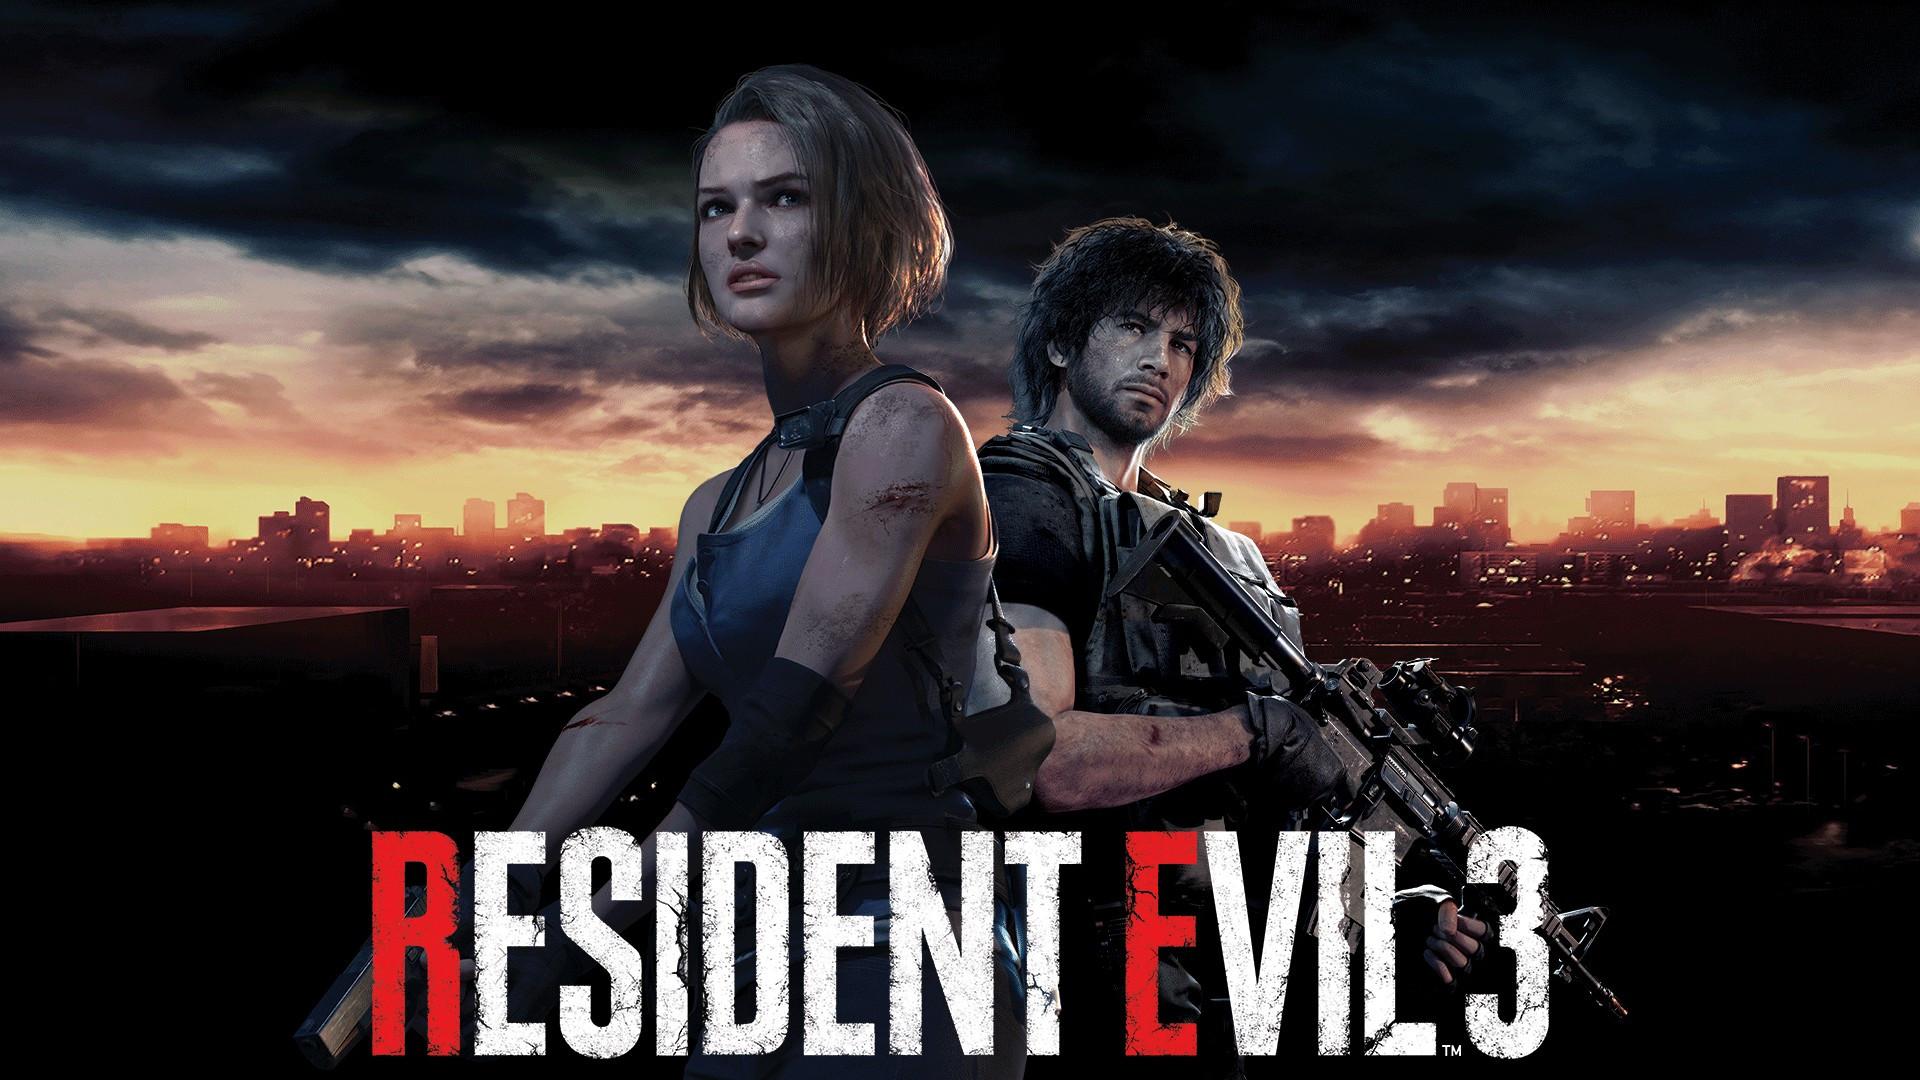 resident evil 4 ps4 controls reddit